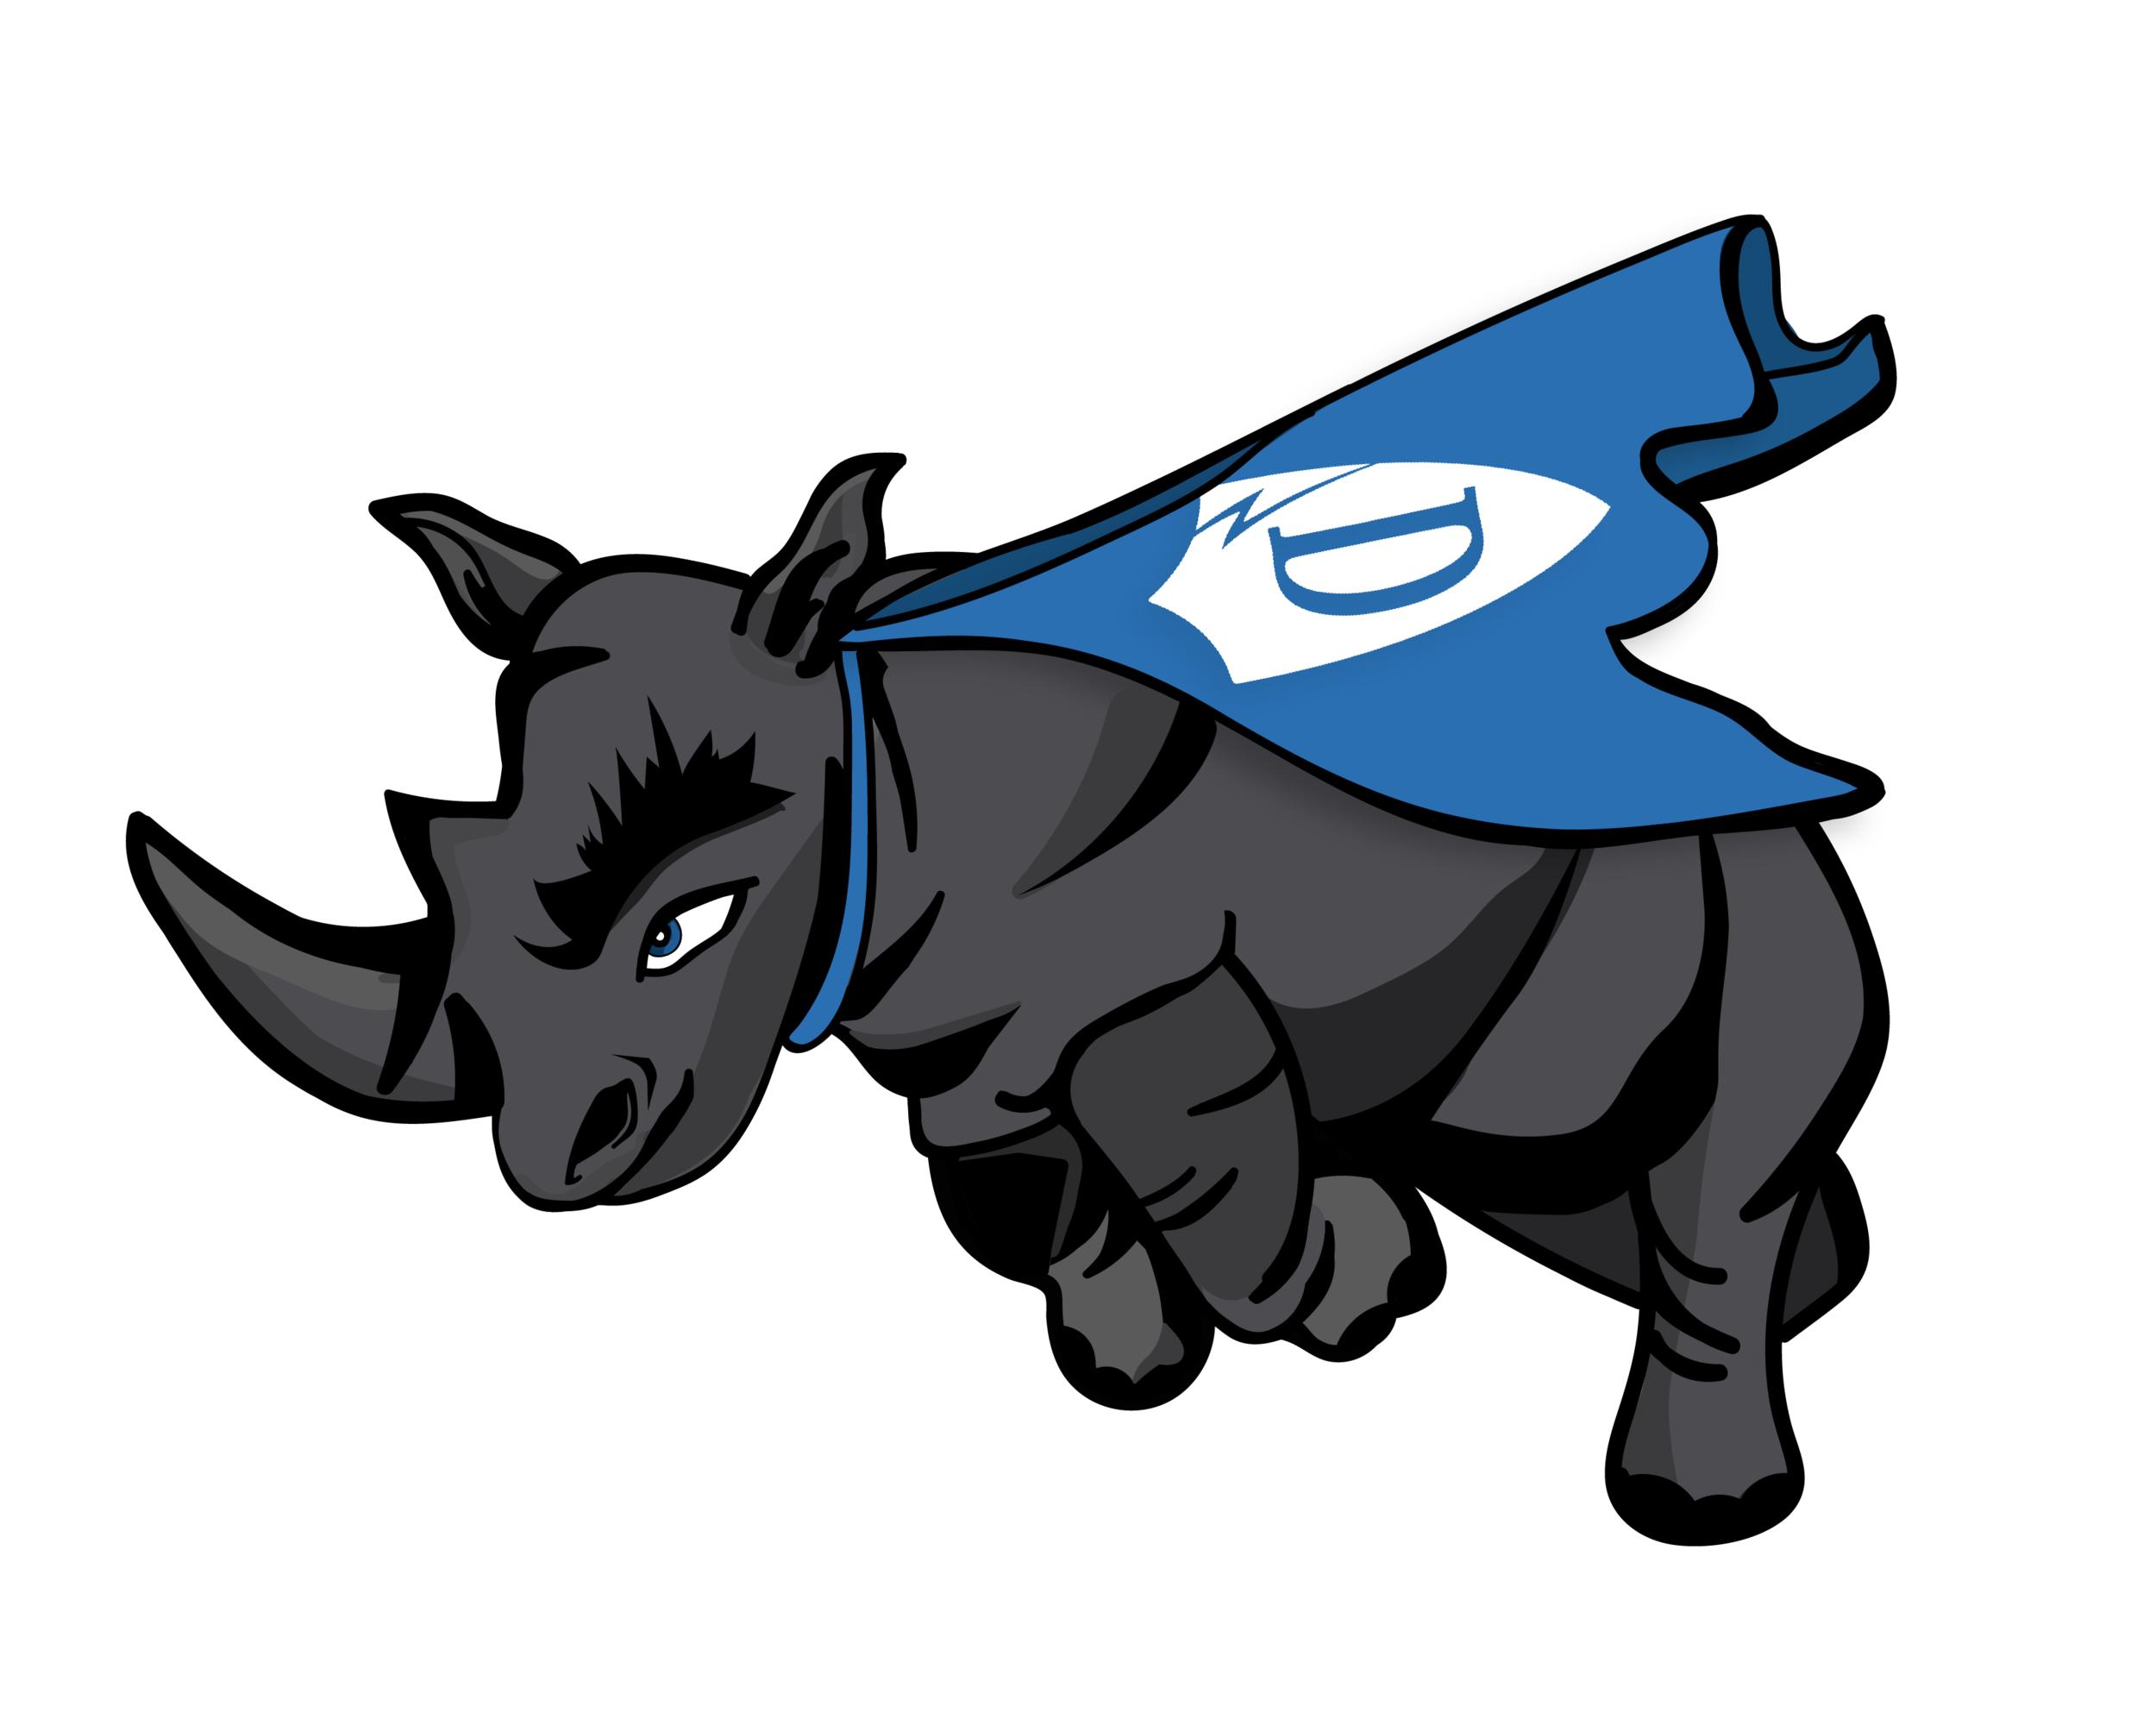 rhino2-01 - Copy.png